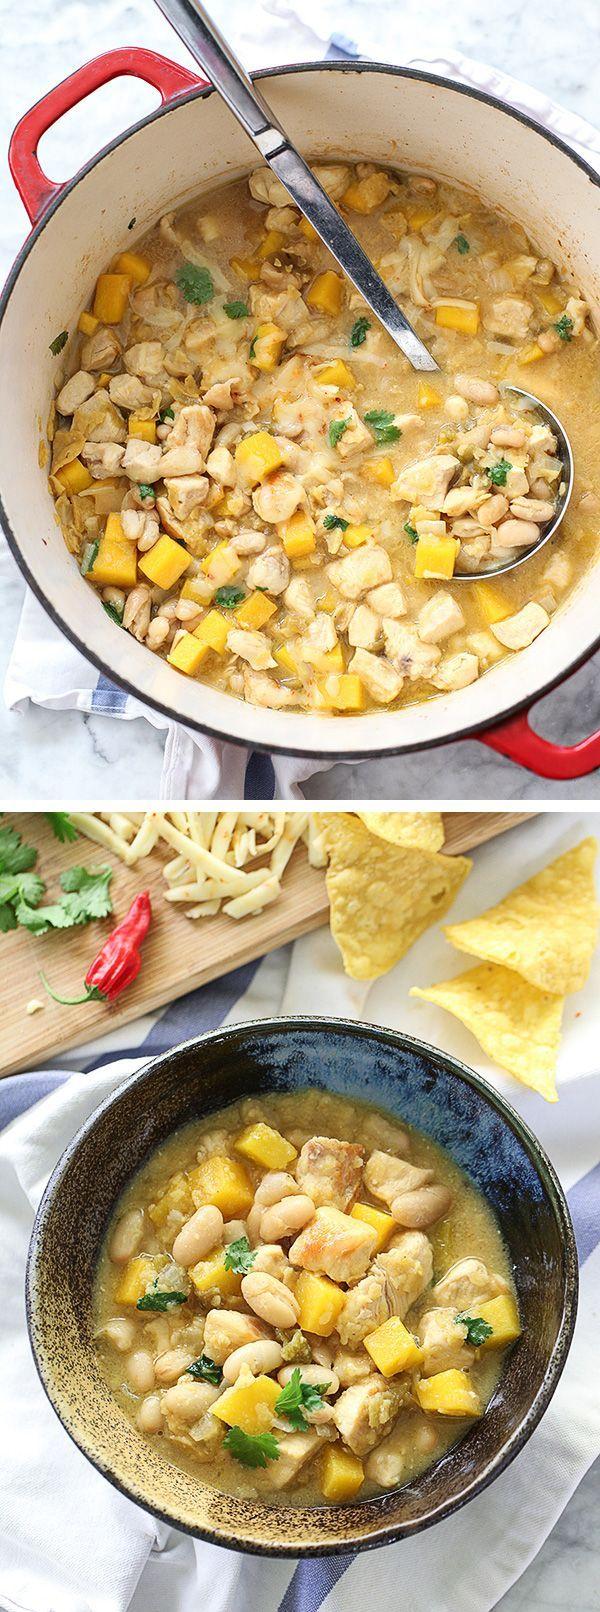 30 Minute White Bean Chicken Chili with Butternut Squash #healthydinner #dinnerideas